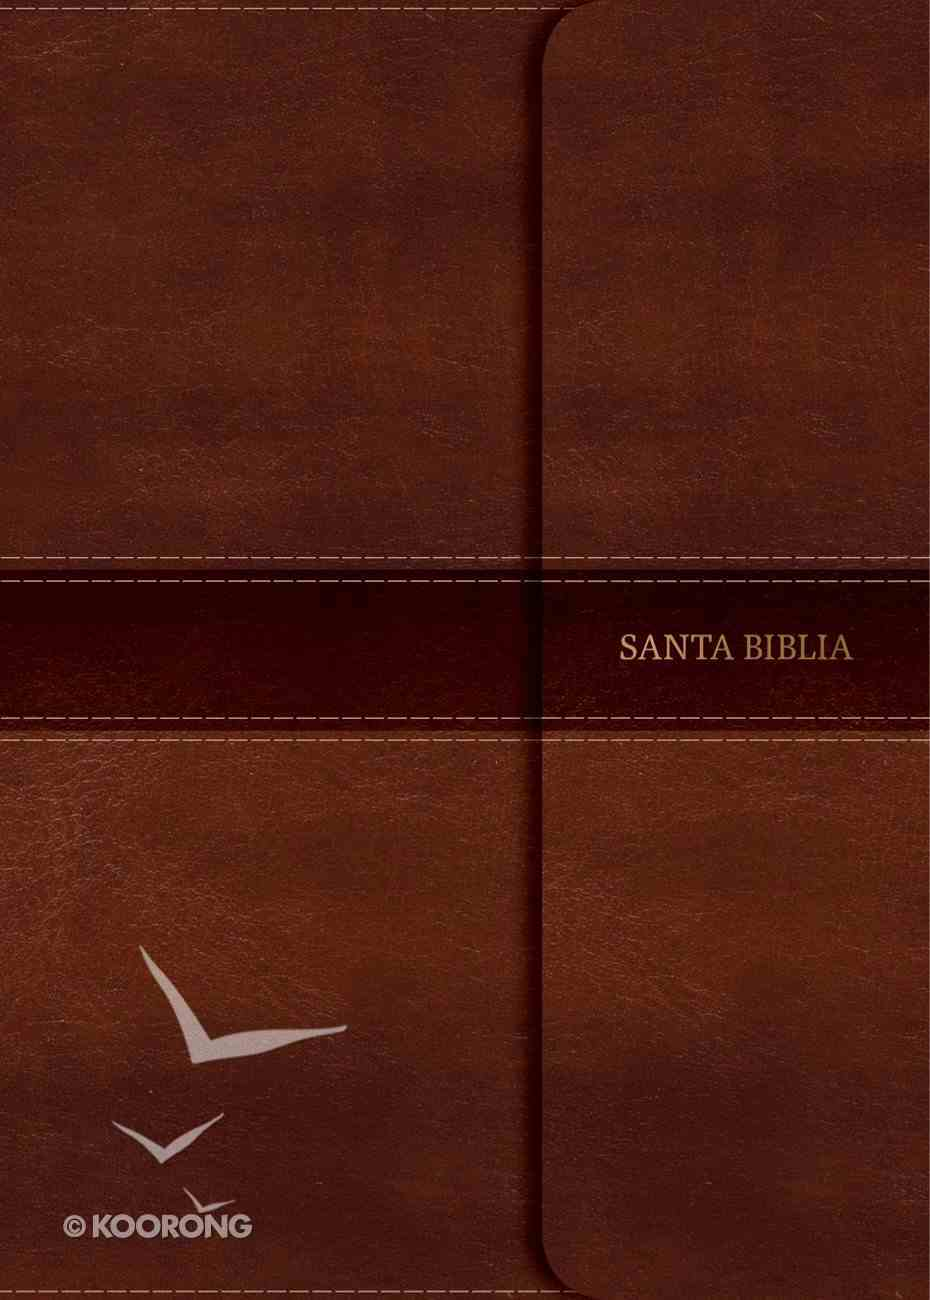 Nvi Biblia Compacta Letra Grande Marron Indice Y Solapa Con Iman (Large Print Indexed Magnetic Flap) Imitation Leather